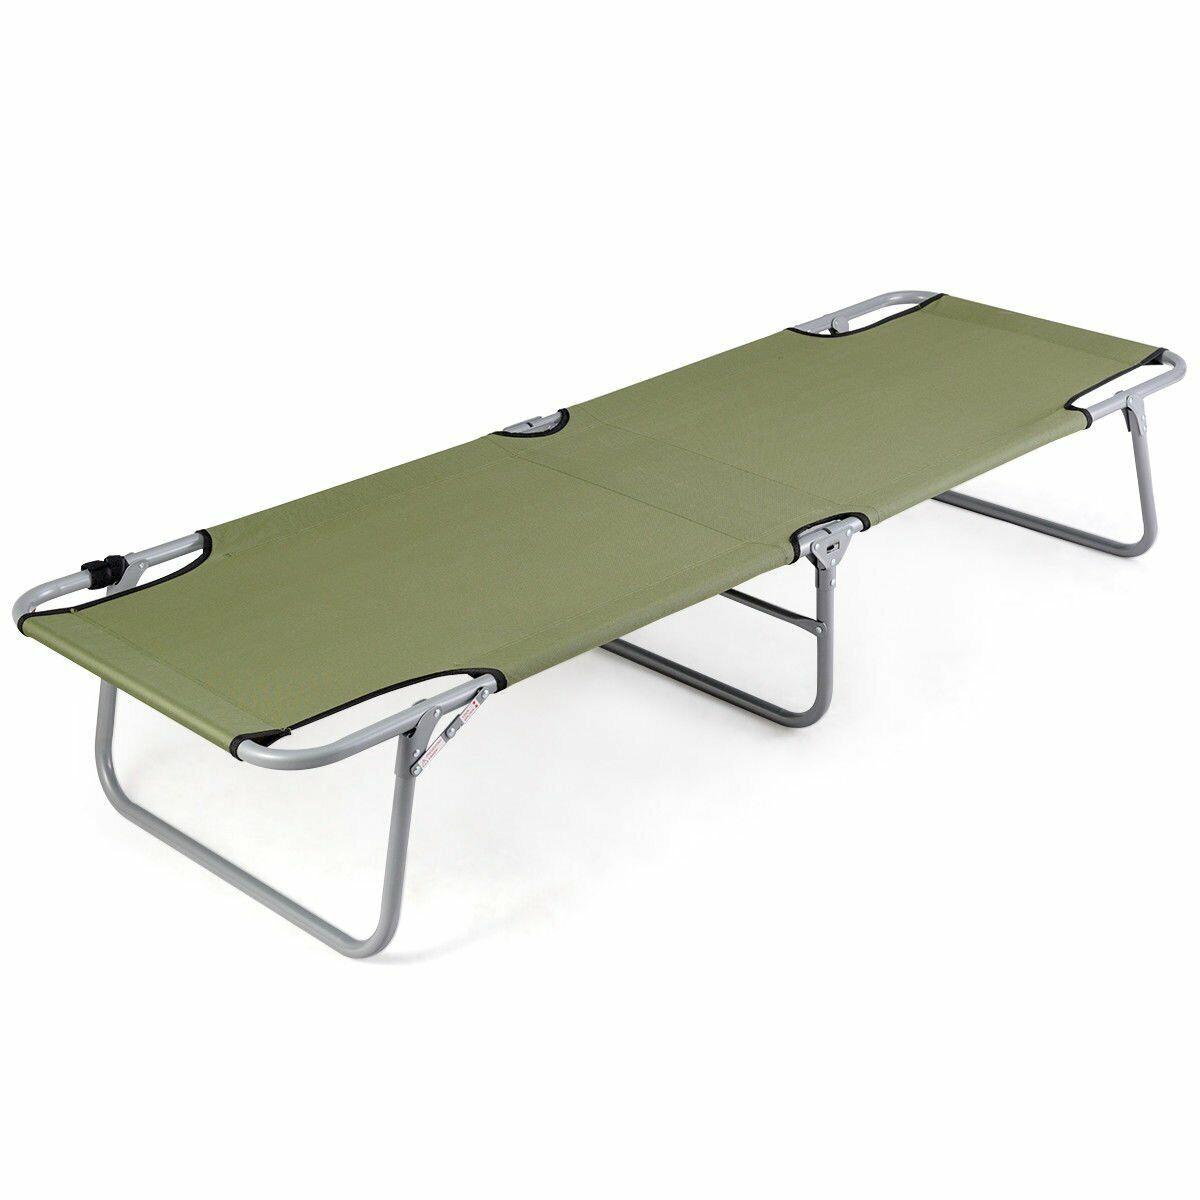 Portable Foldable campeggio Bed Army Military campeggio Cot